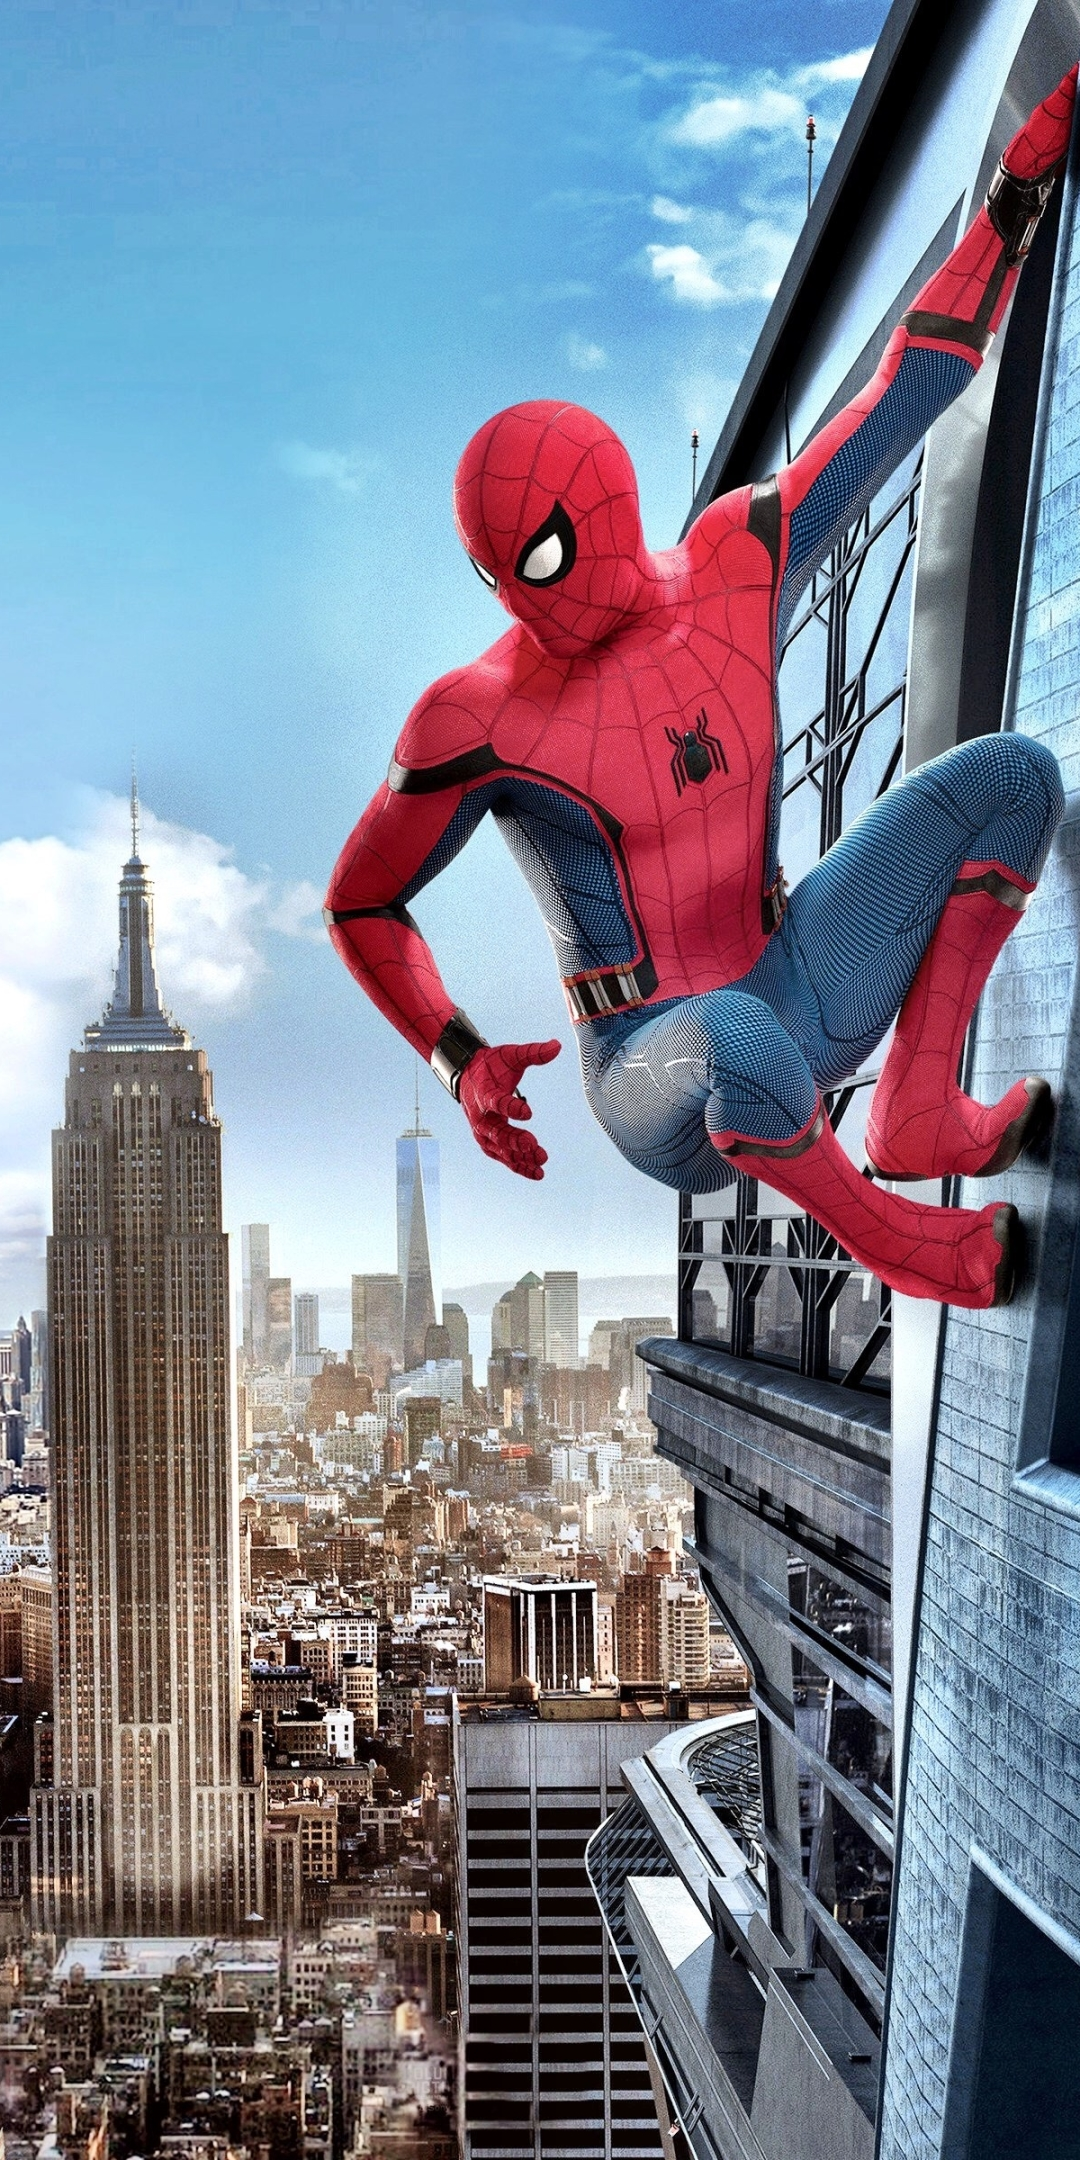 MovieSpider Man Homecoming 1080x2160 Wallpaper ID 714882 1080x2160